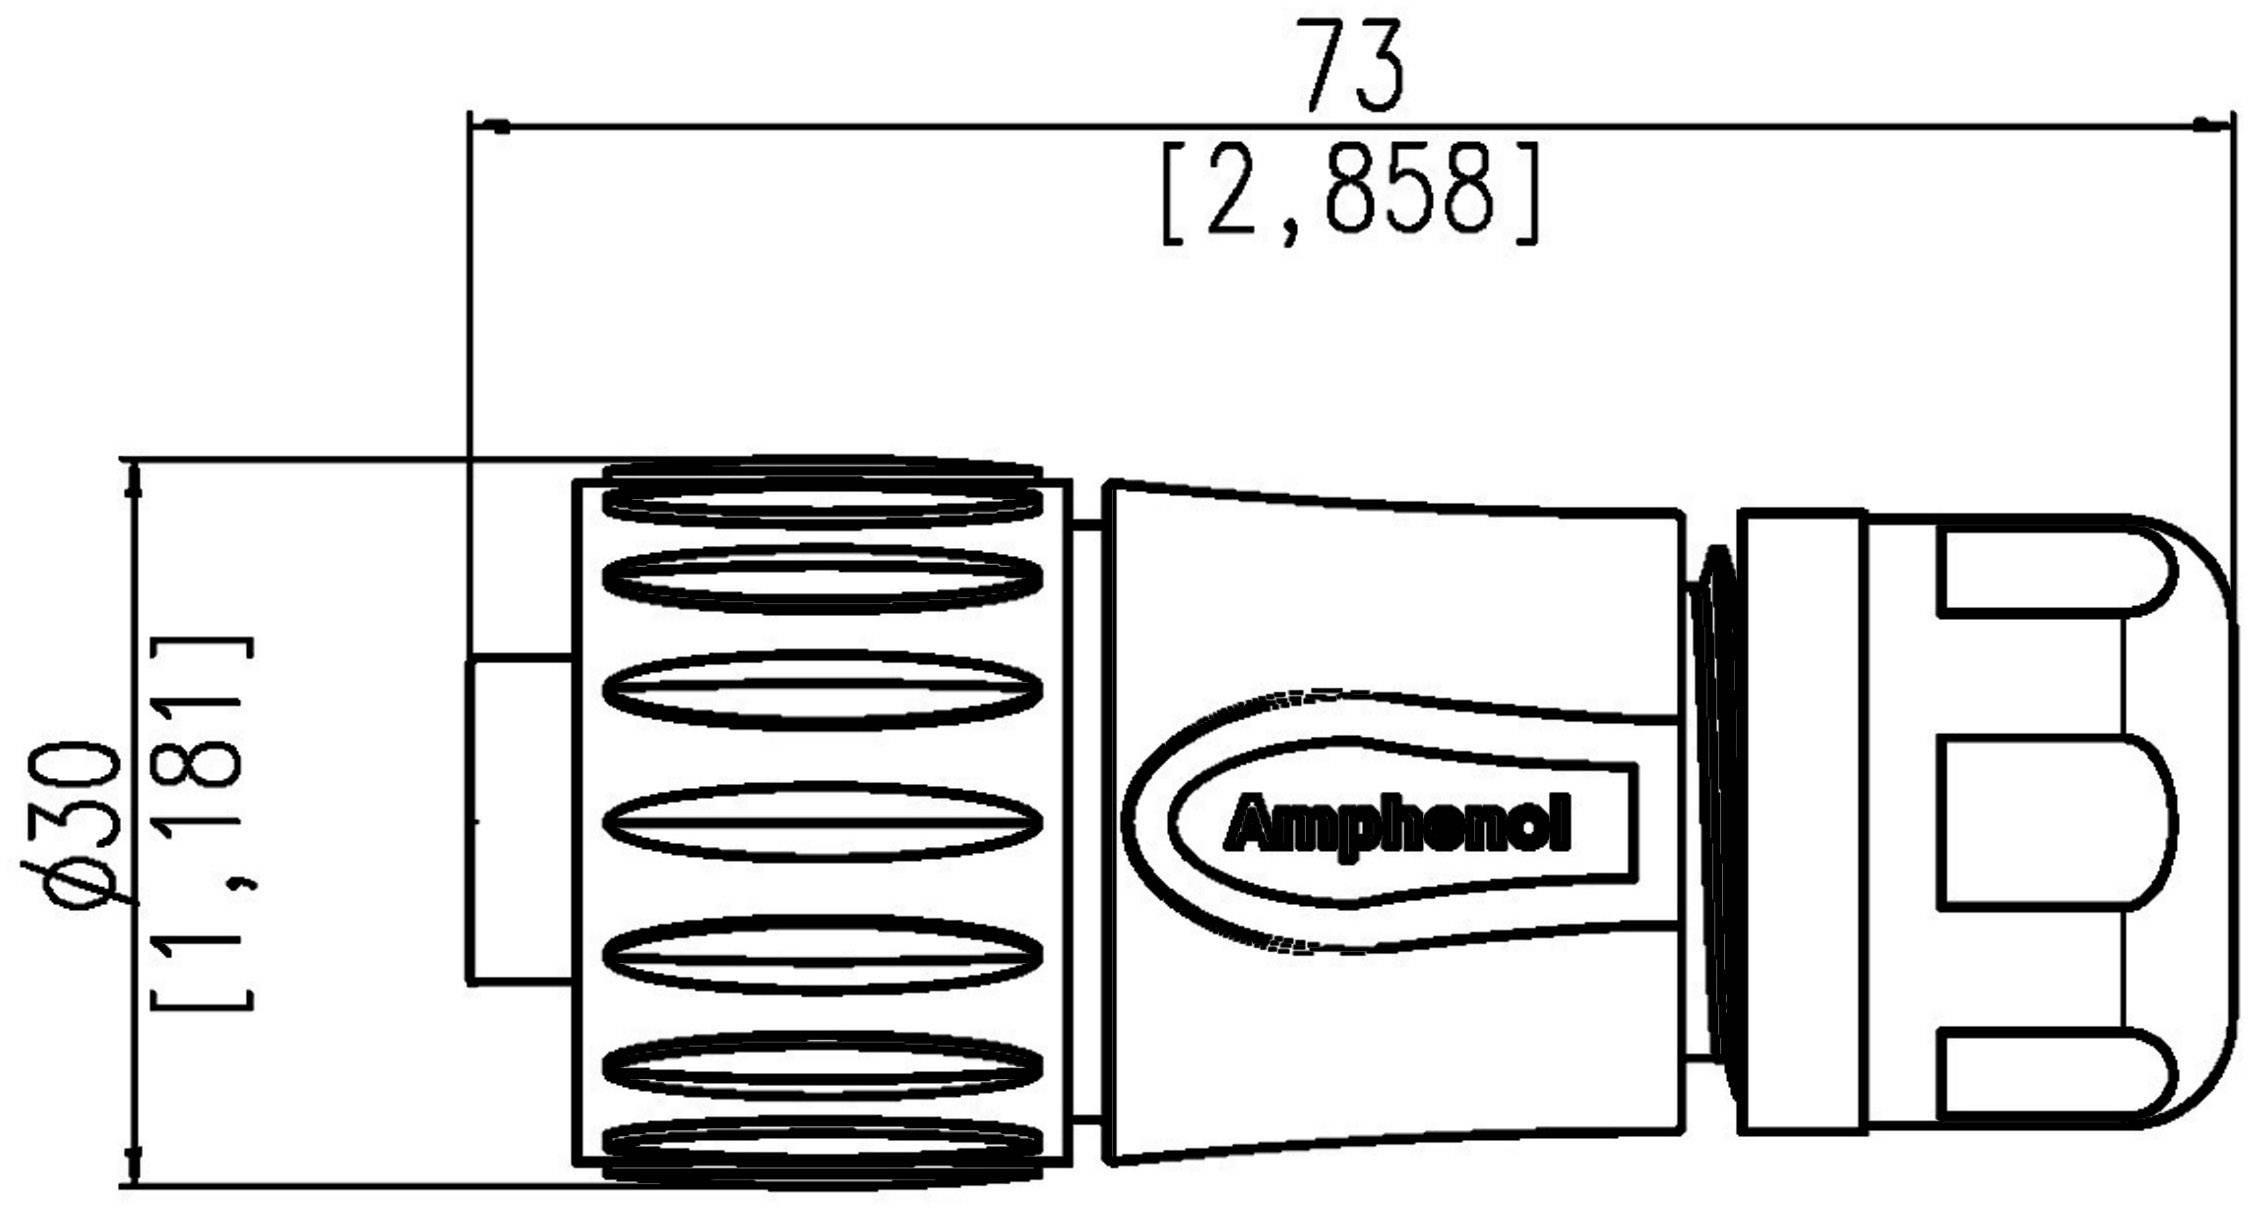 Guľatý faston Amphenol C016 20H003 110 12 IP67 (v zablokovanom stave), polyamid 6.6, pólů 3 + PE, 1 ks